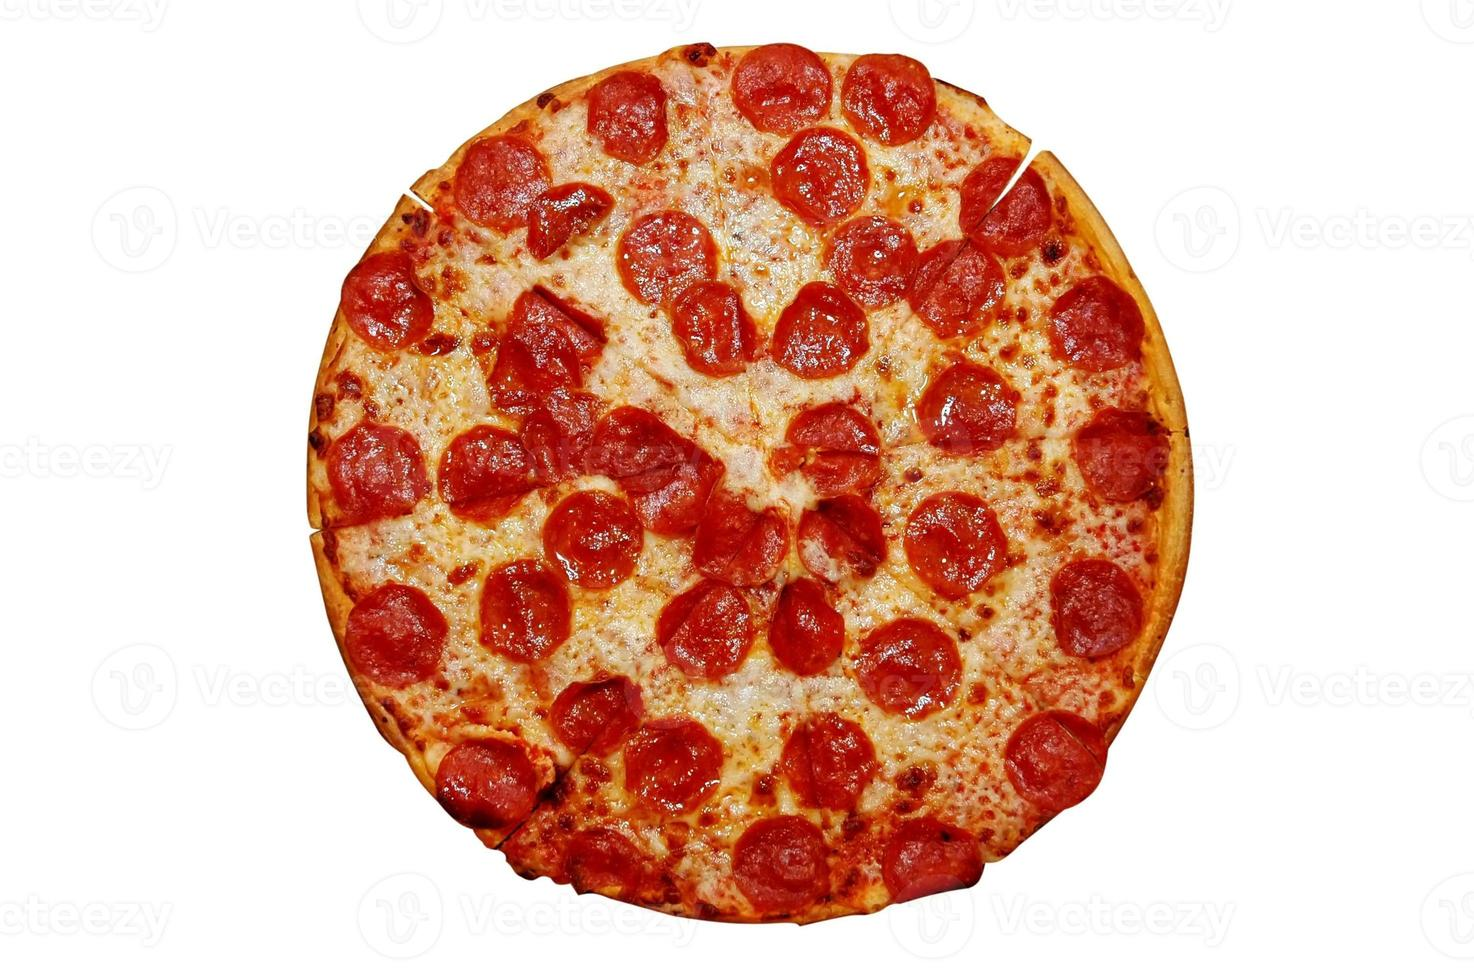 hele pepperoni pizza foto